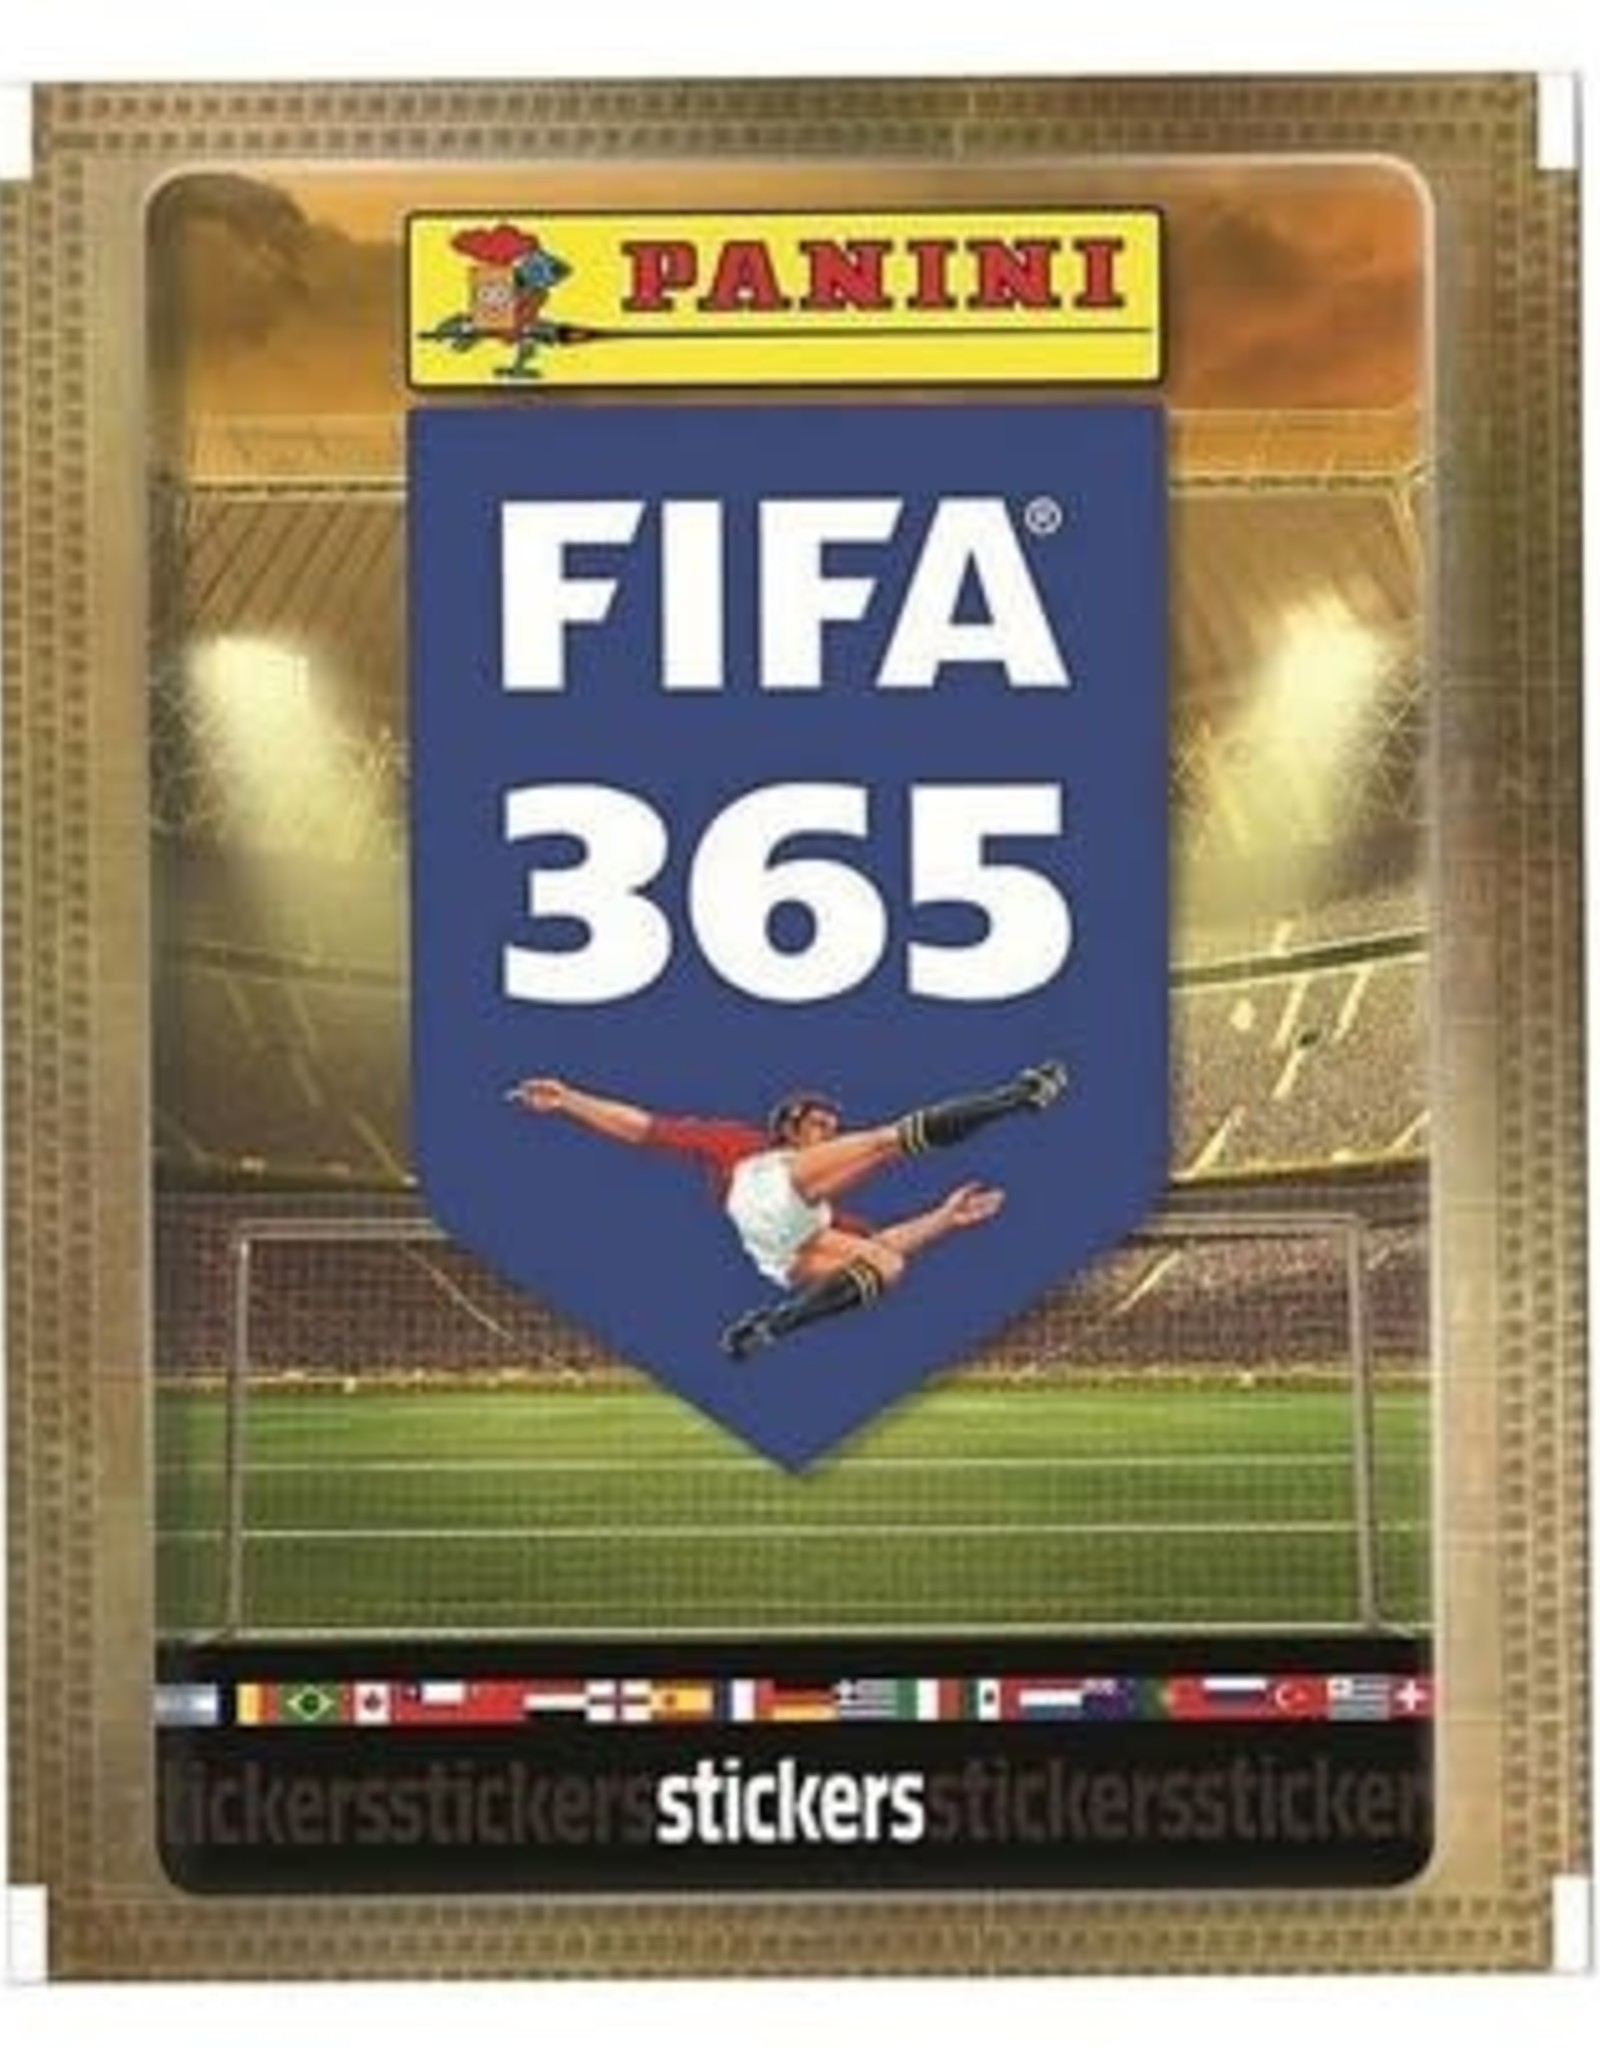 FIFA 365 Sticker Pack